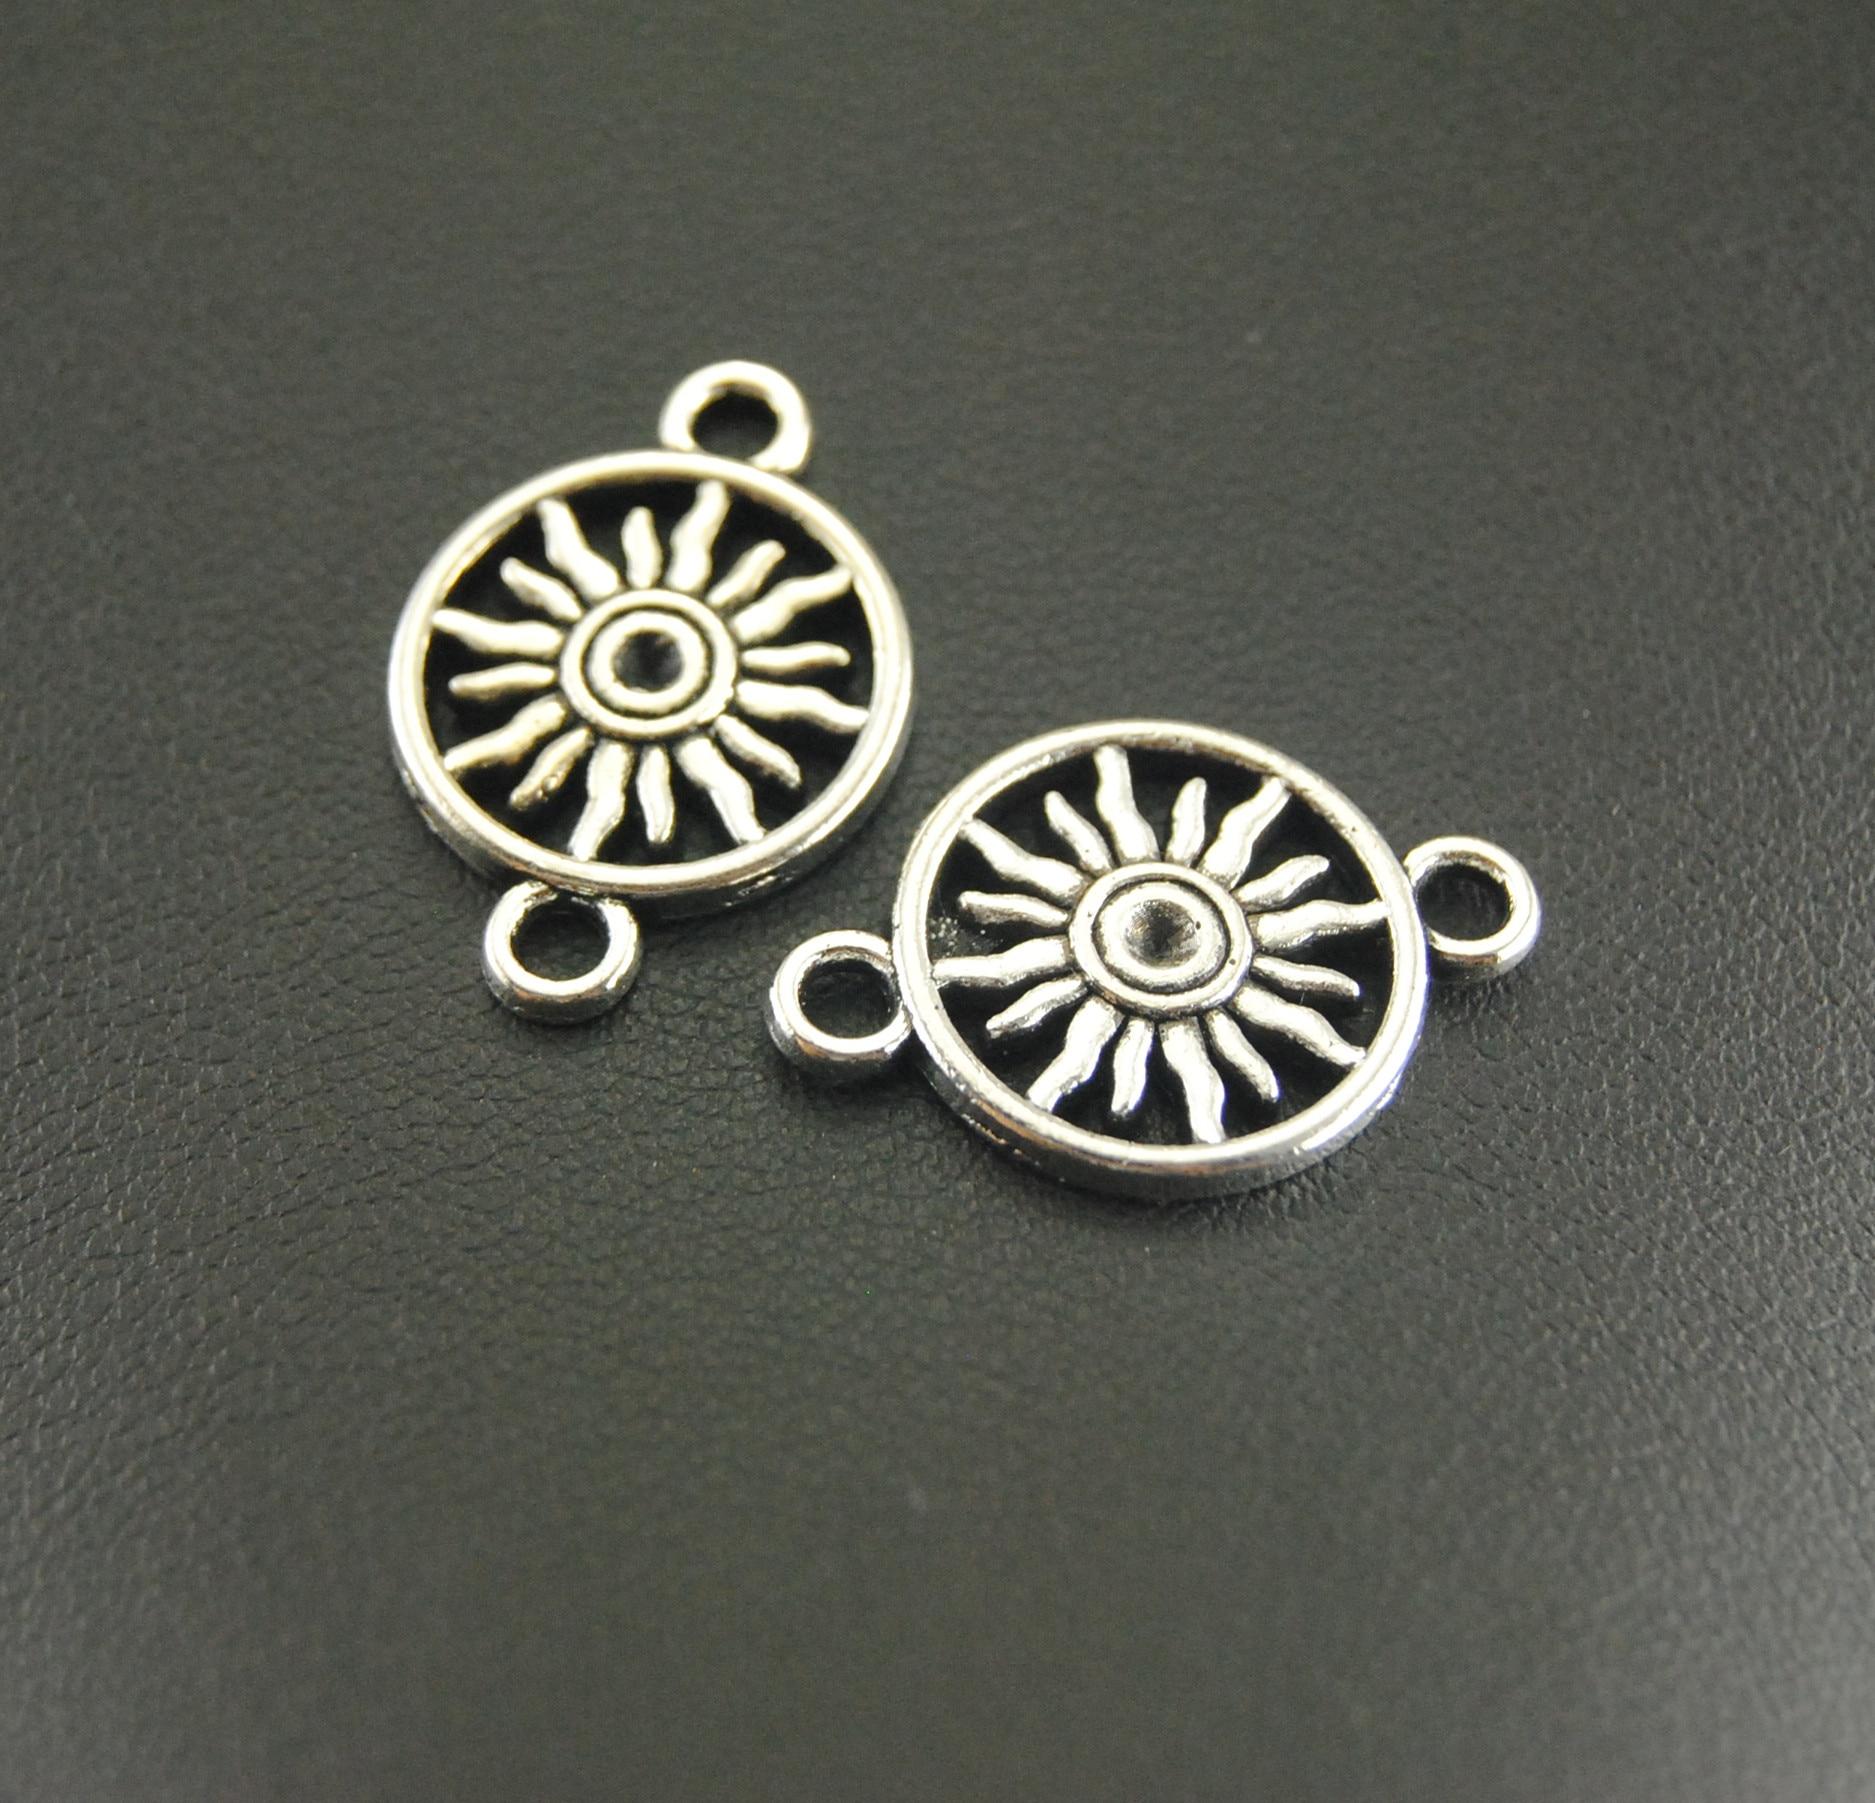 10Pcs Antique Silver Sun Charm Jewelry Making DIY Handmade Craft A856